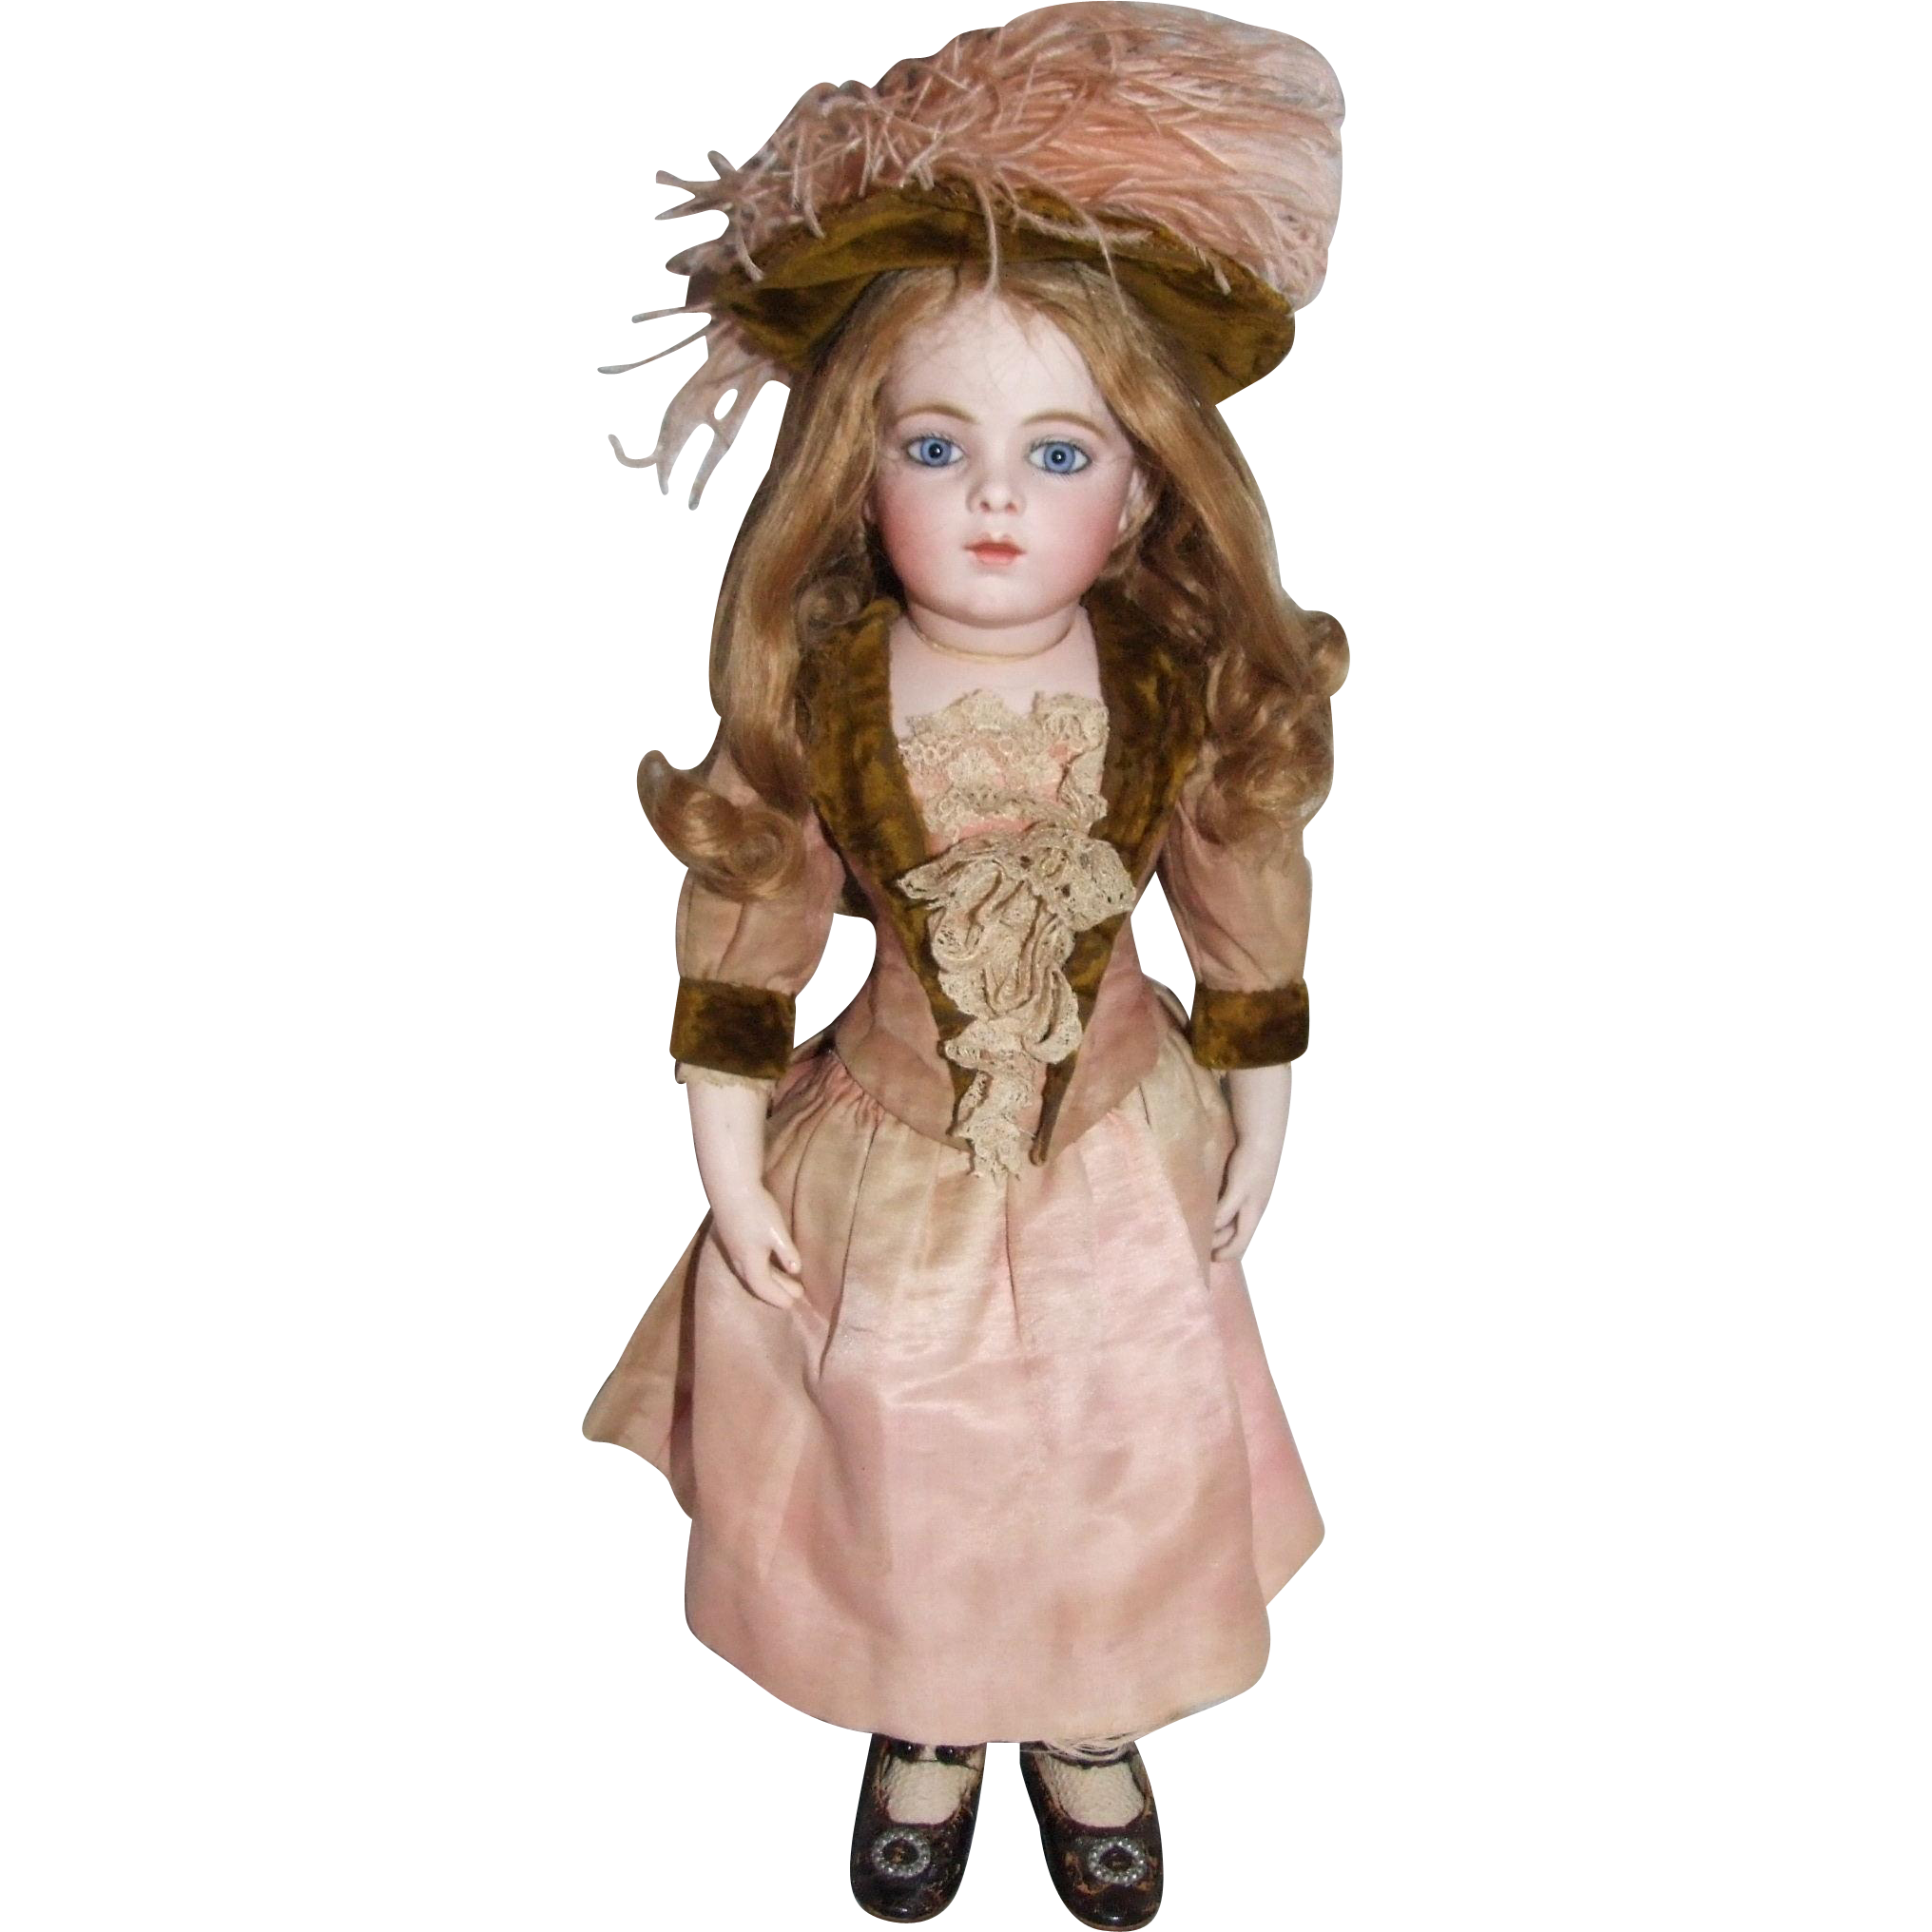 Original 1880s antique Bru Jne 6 dress, peach silk-satin